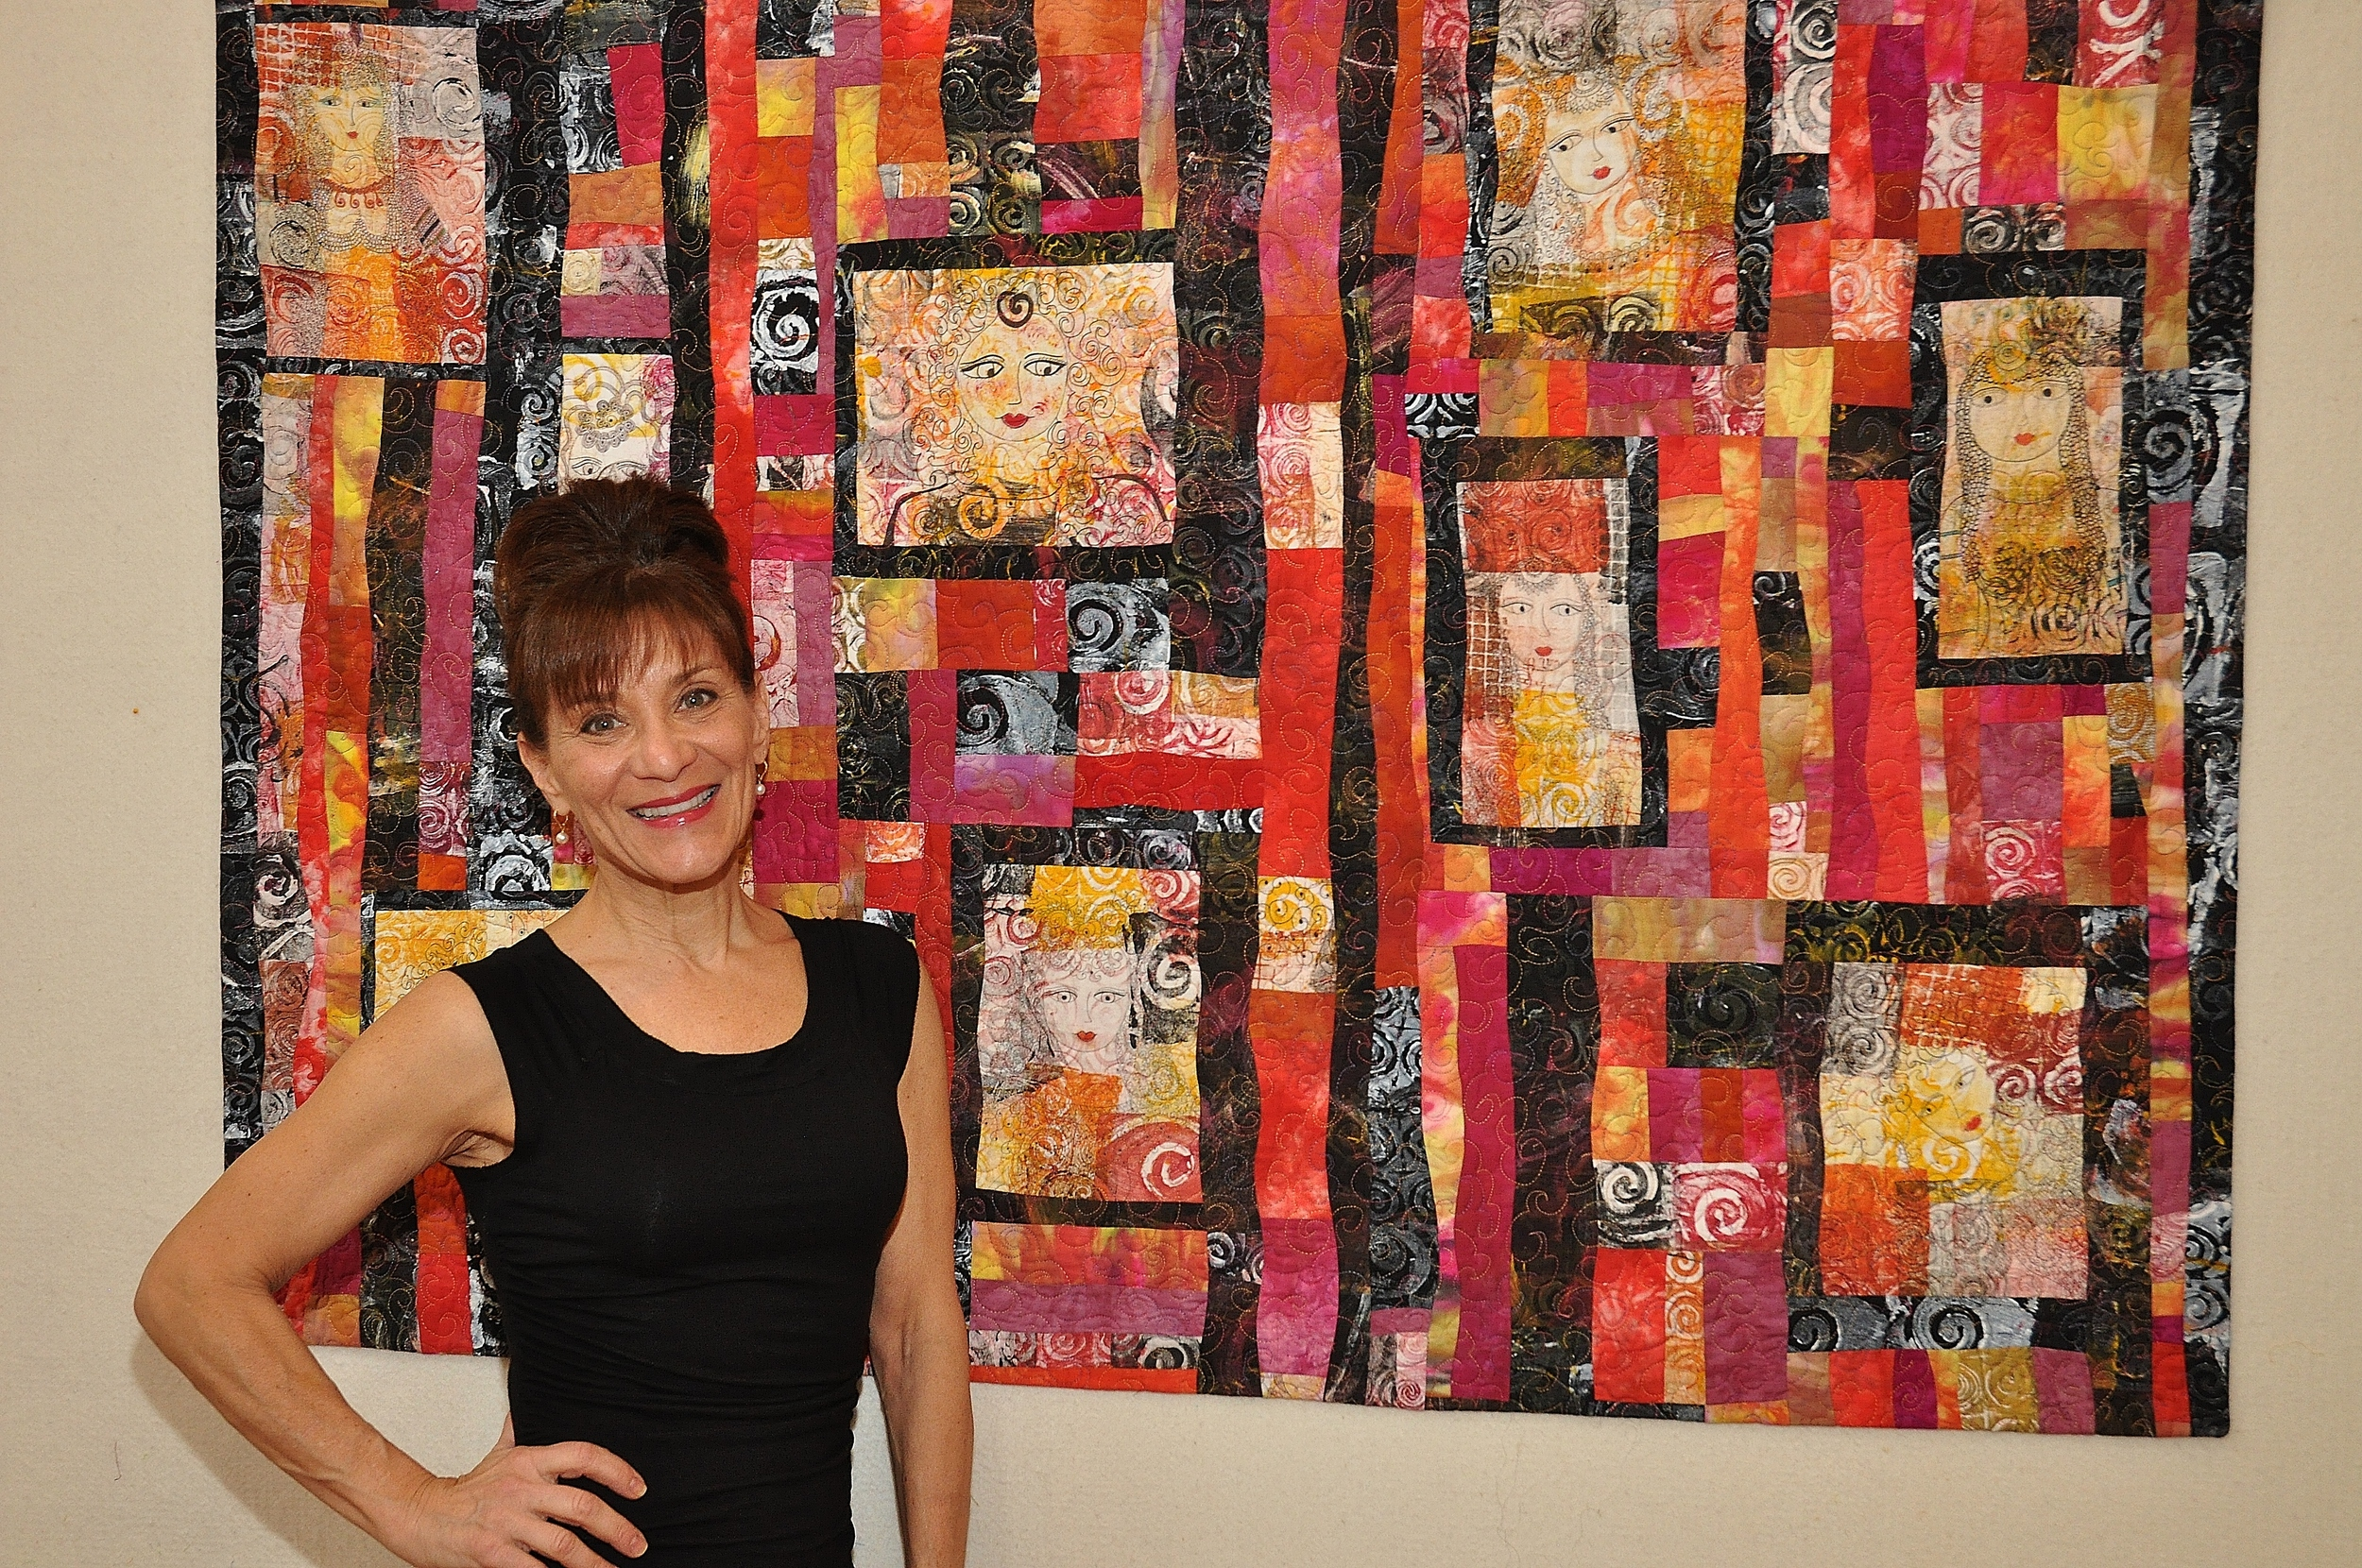 Susan Schrott Nine Fiaces of Women copy.JPG